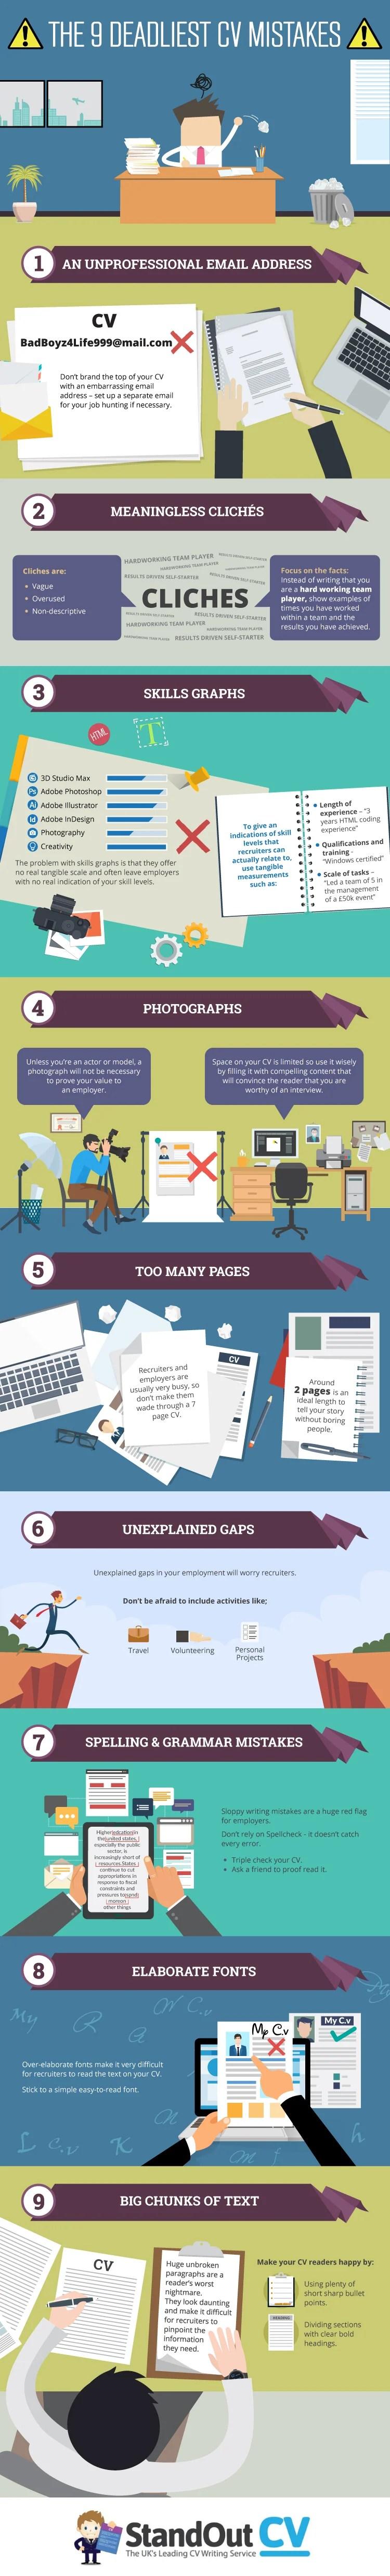 Avoid Making Resume Mistakes